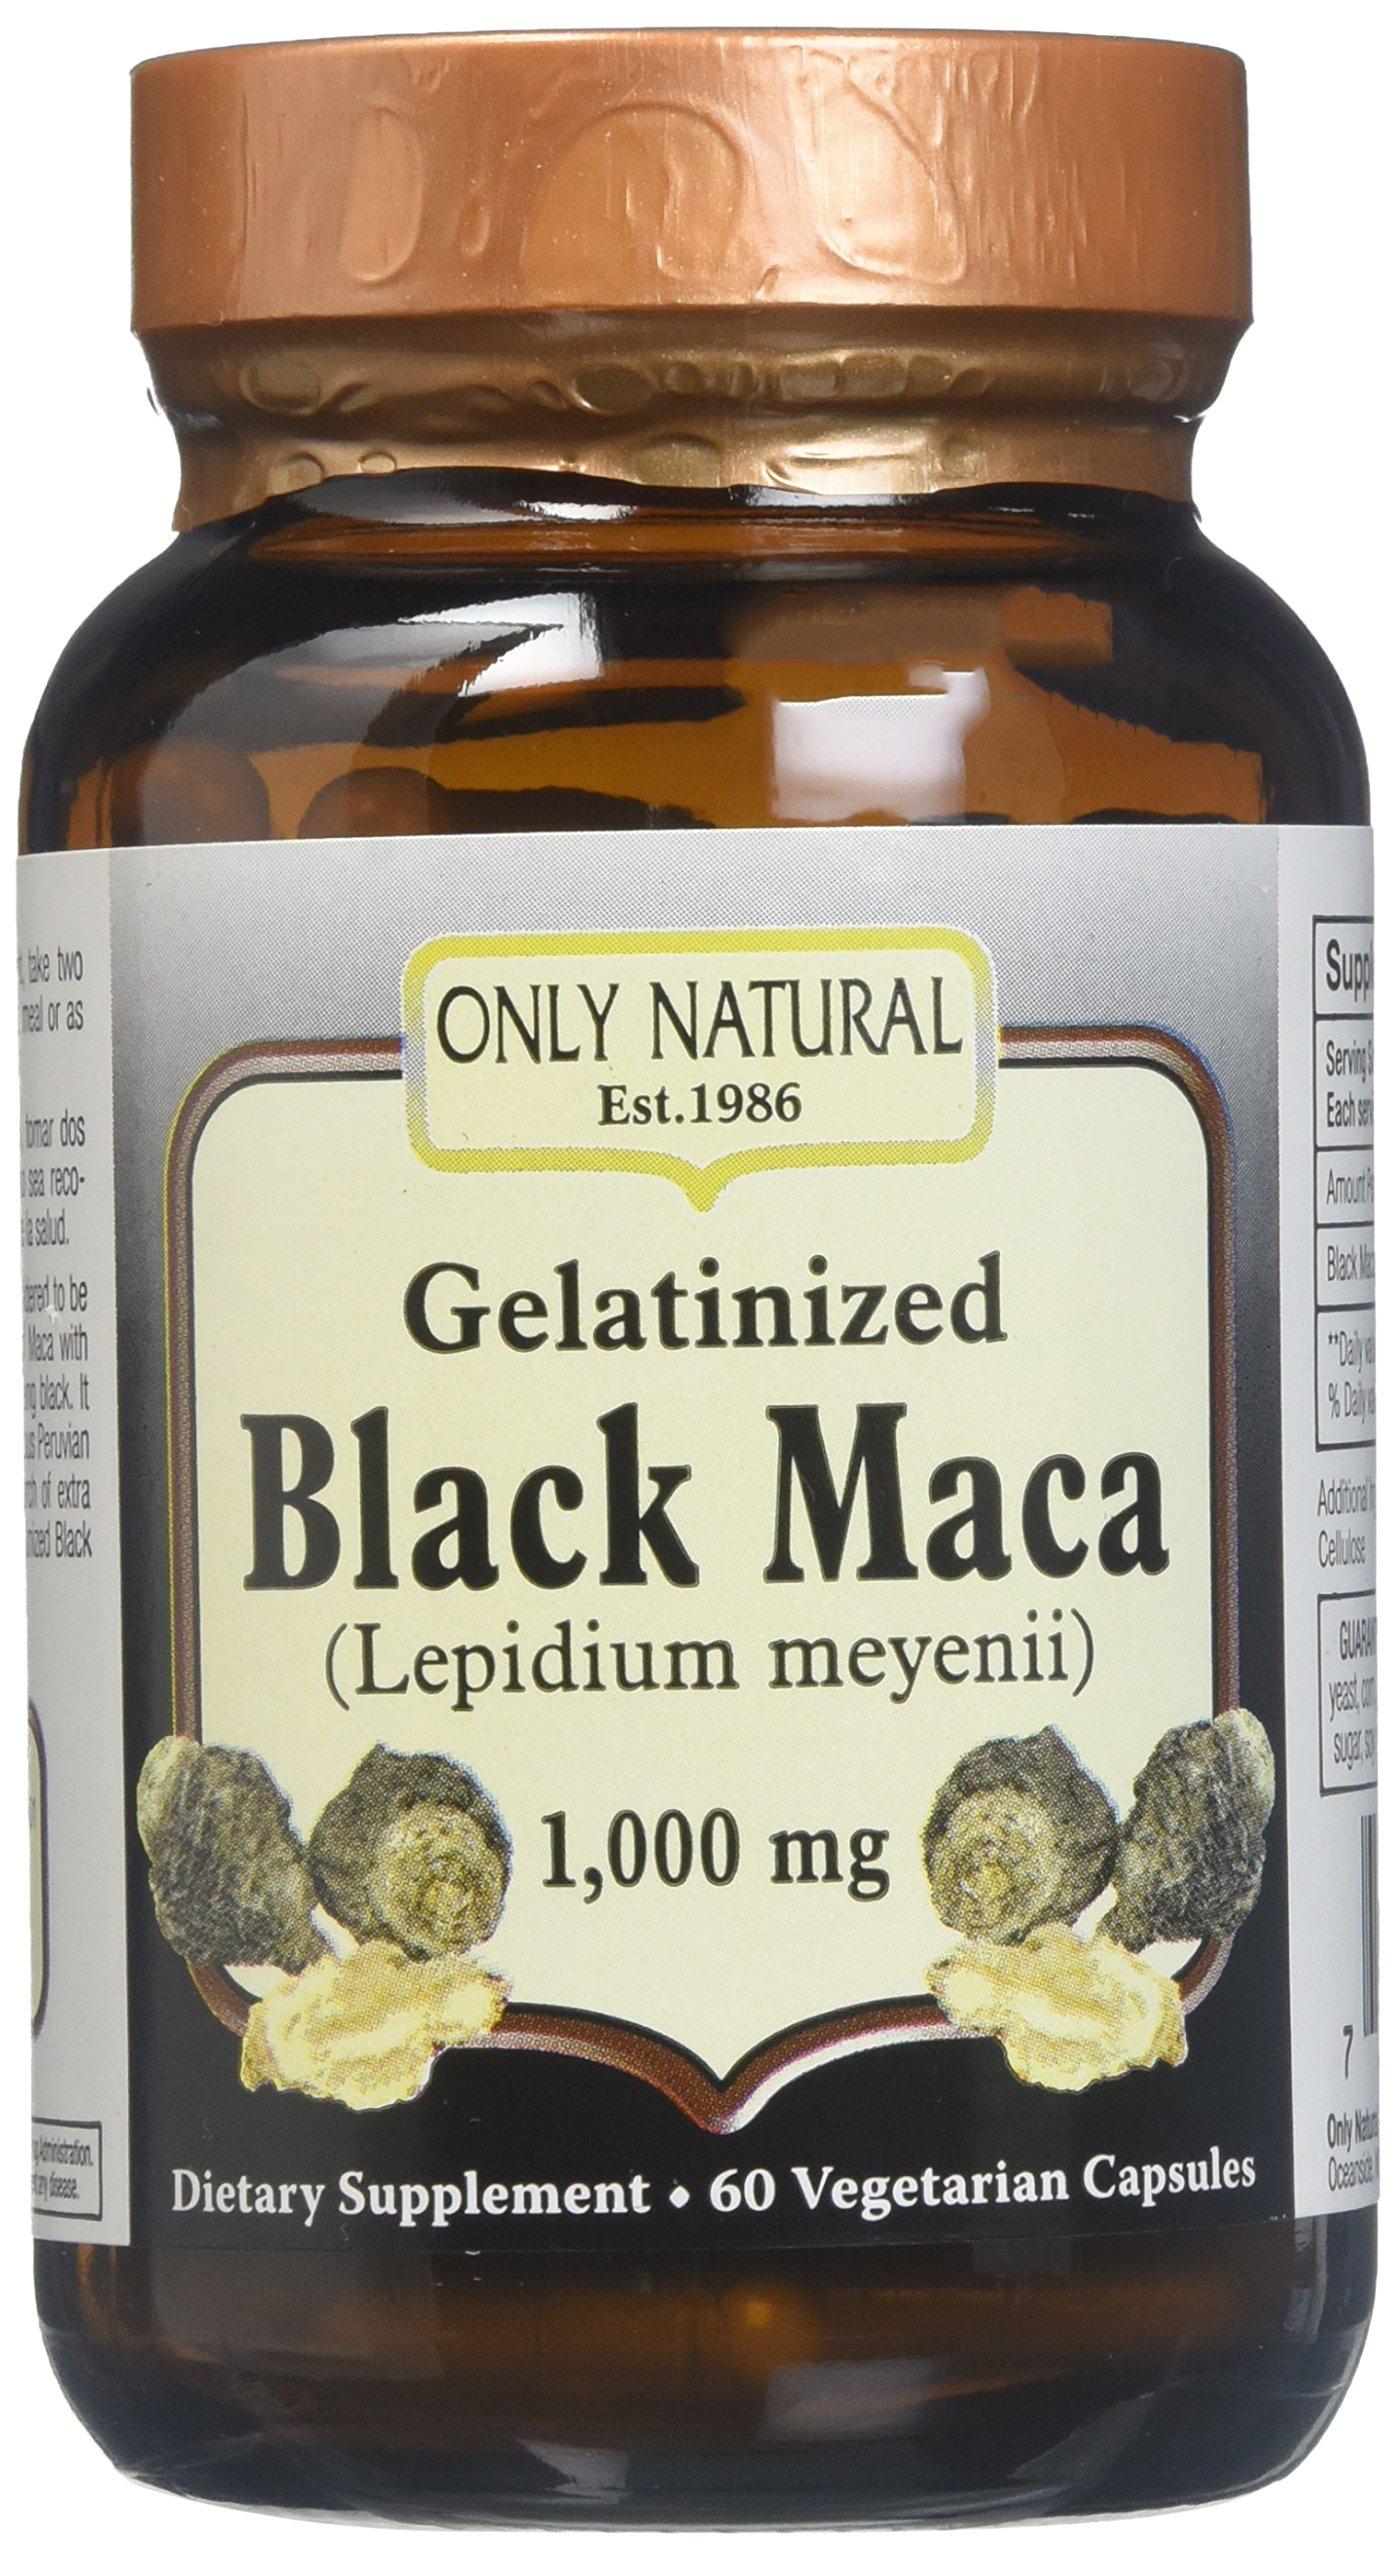 ONLY NATURAL Gelatinized Black Maca 1000 mg 60 Vgc, 0.02 Pound